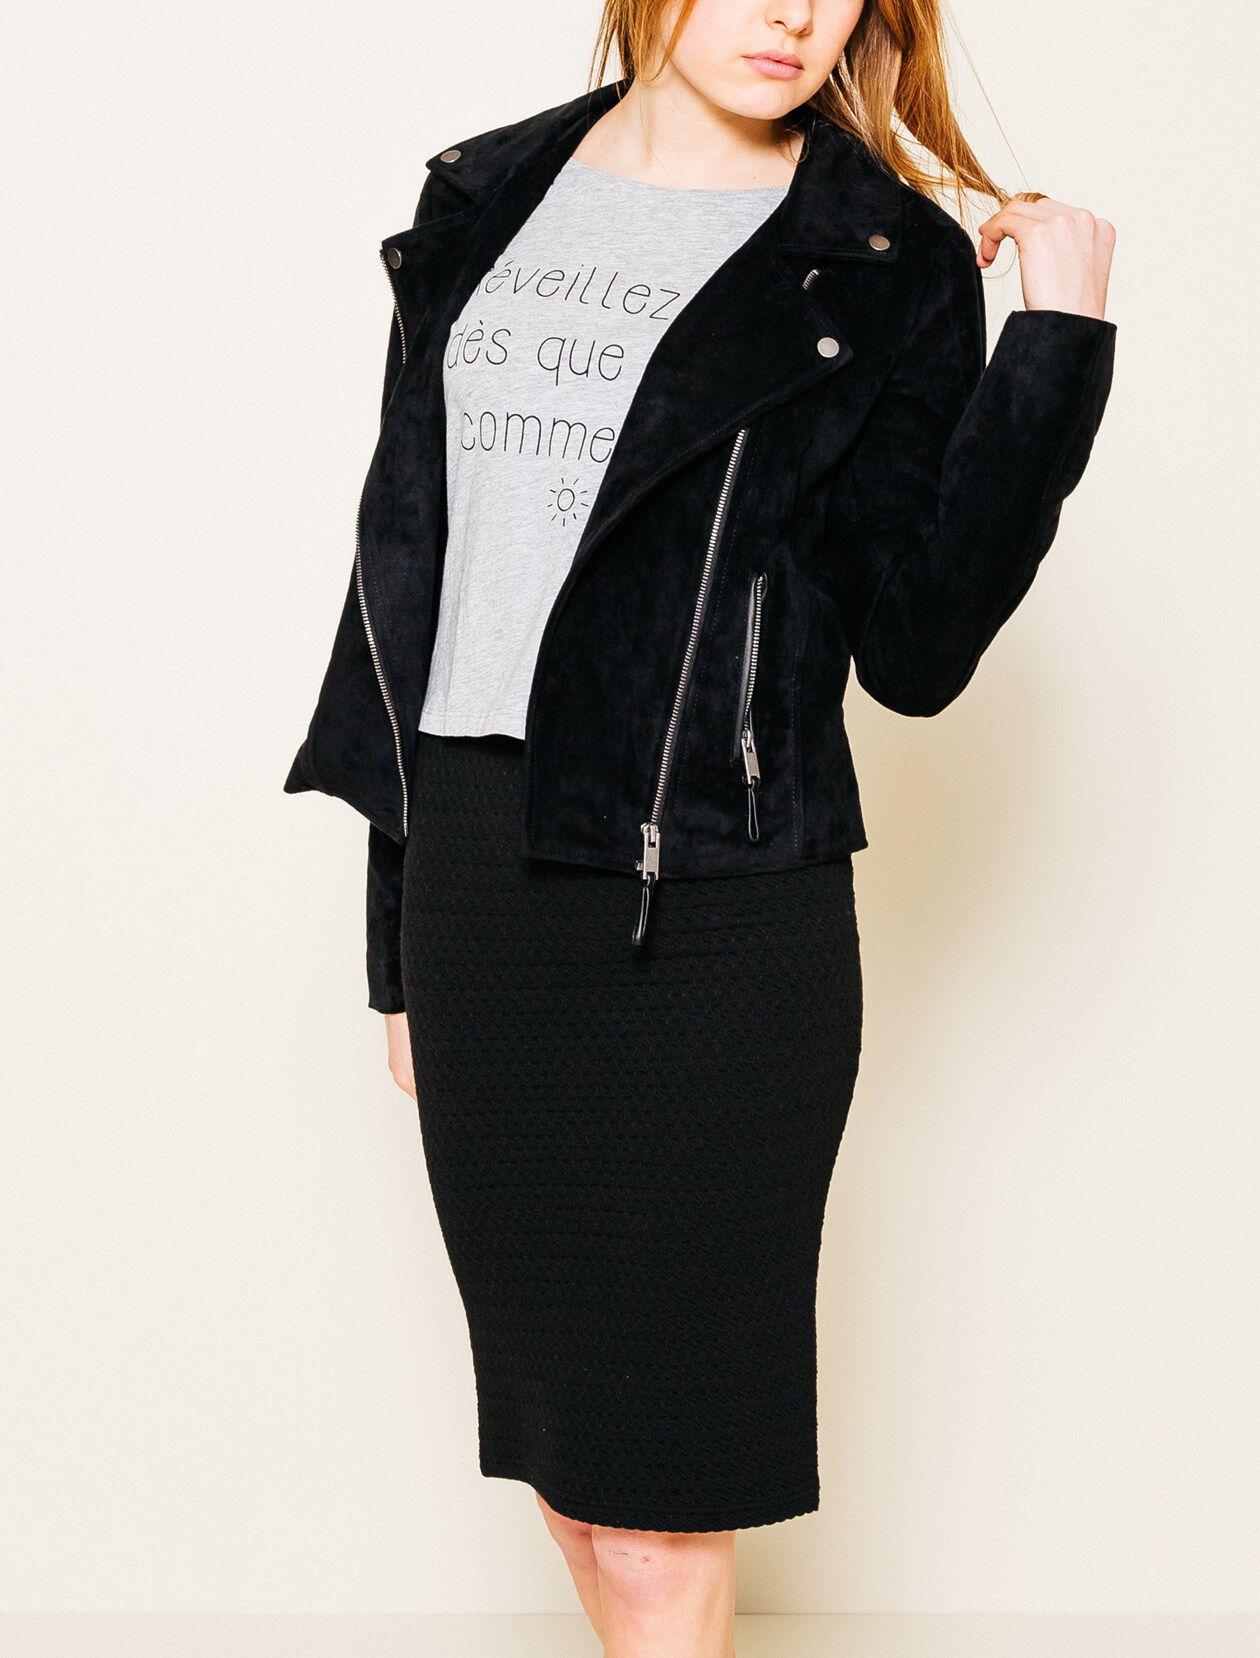 Veste suedine femme noir